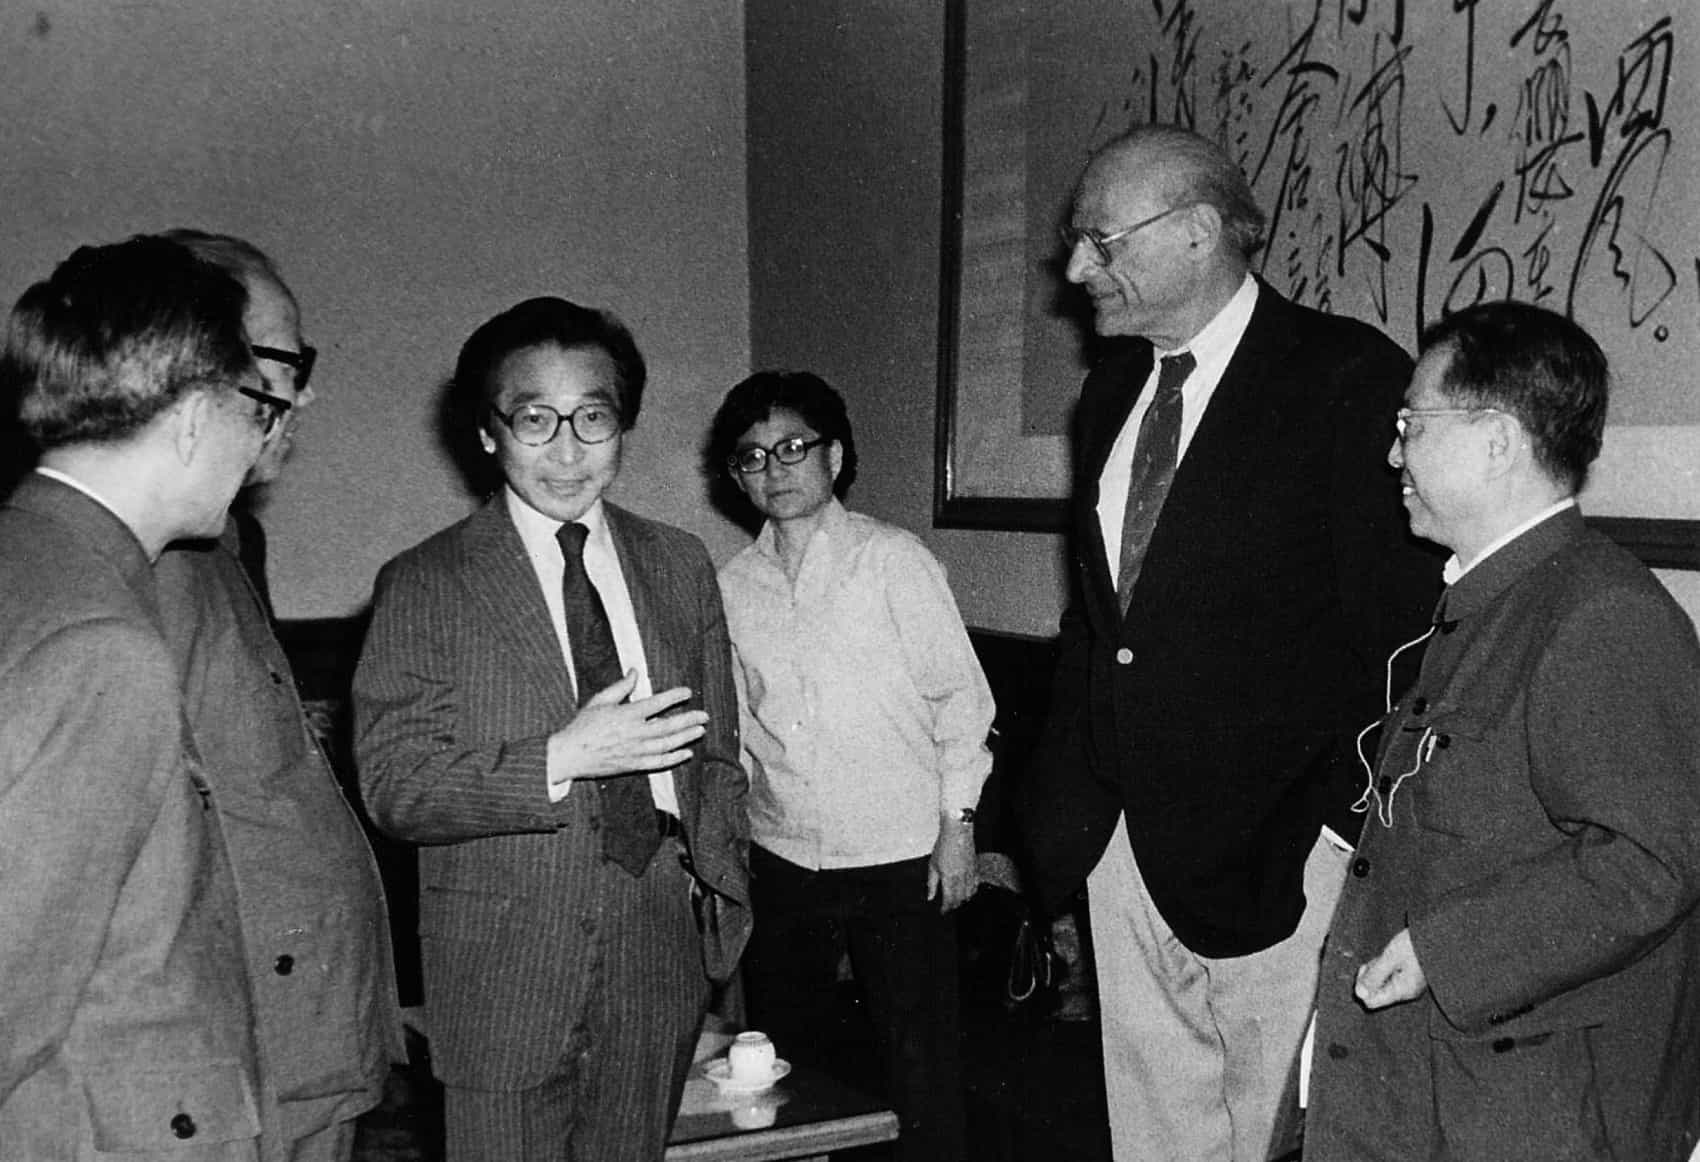 Chou Wen-chung with Arthur Miller and Cao Yu, 1980